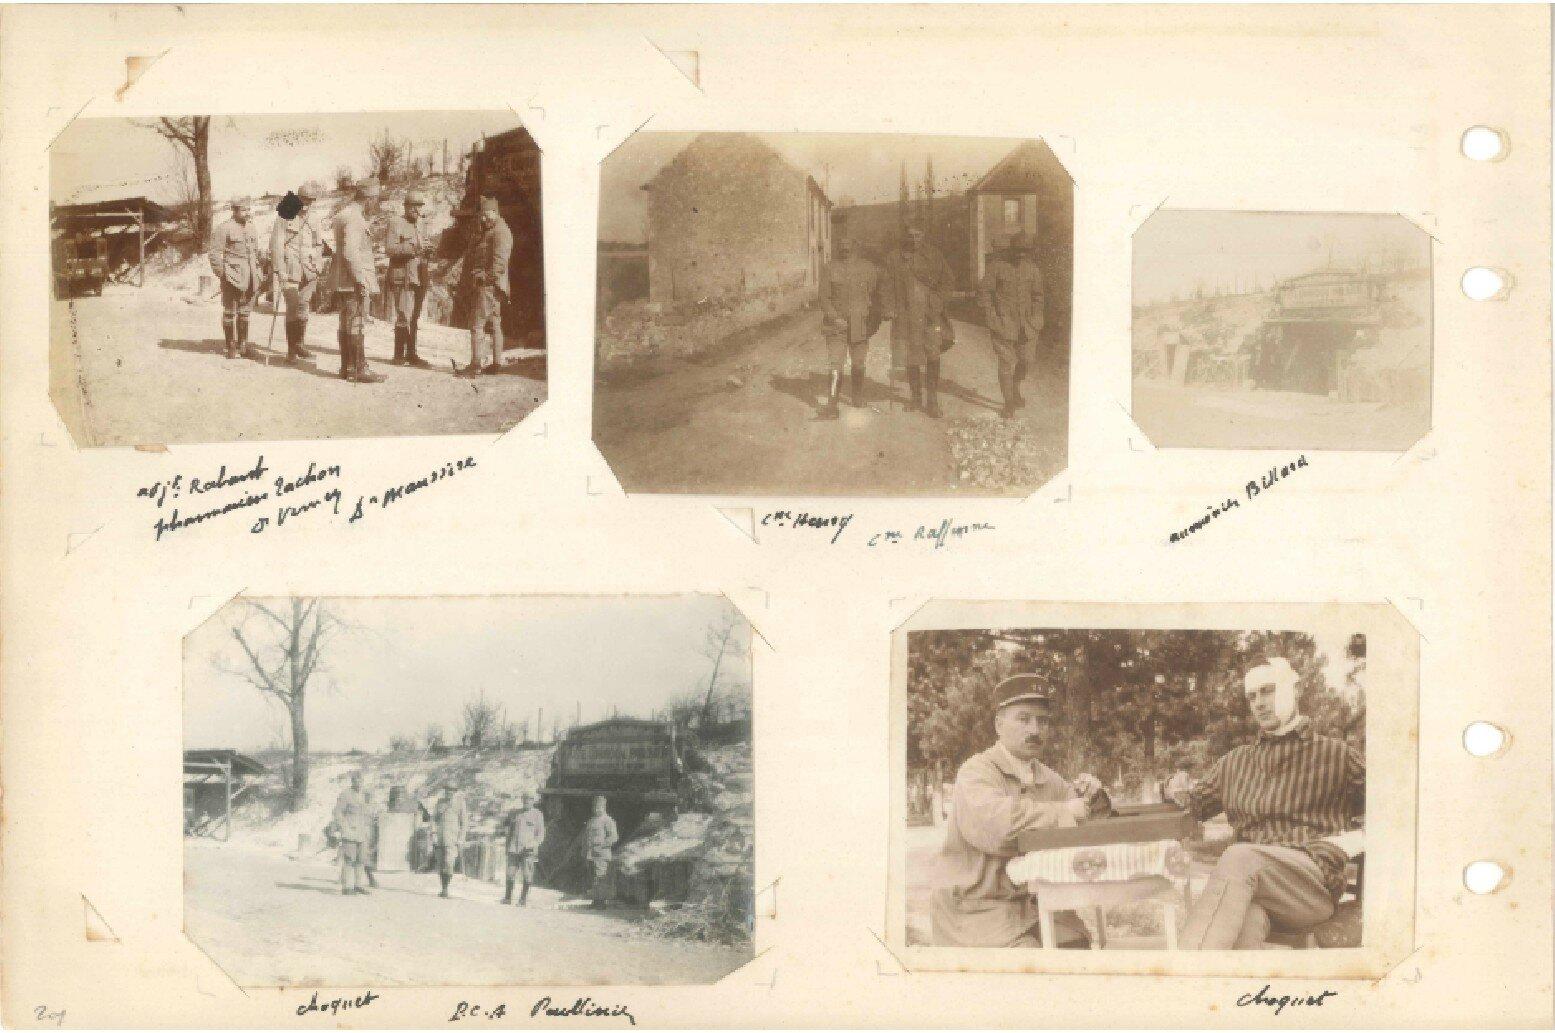 p.201 Secteur de Champagne 74e RI (14 mars – 25 mai 1918)